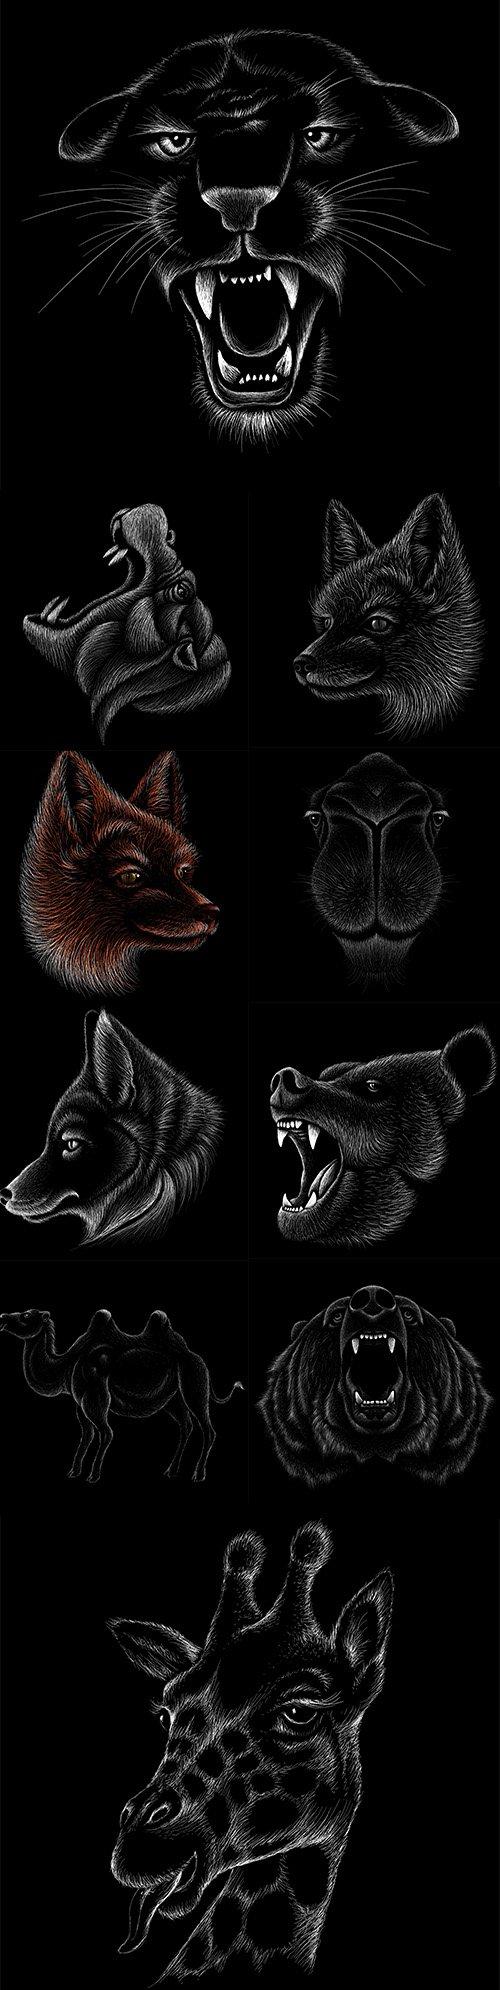 Hand Drawn Animals Illustrations Vector Set